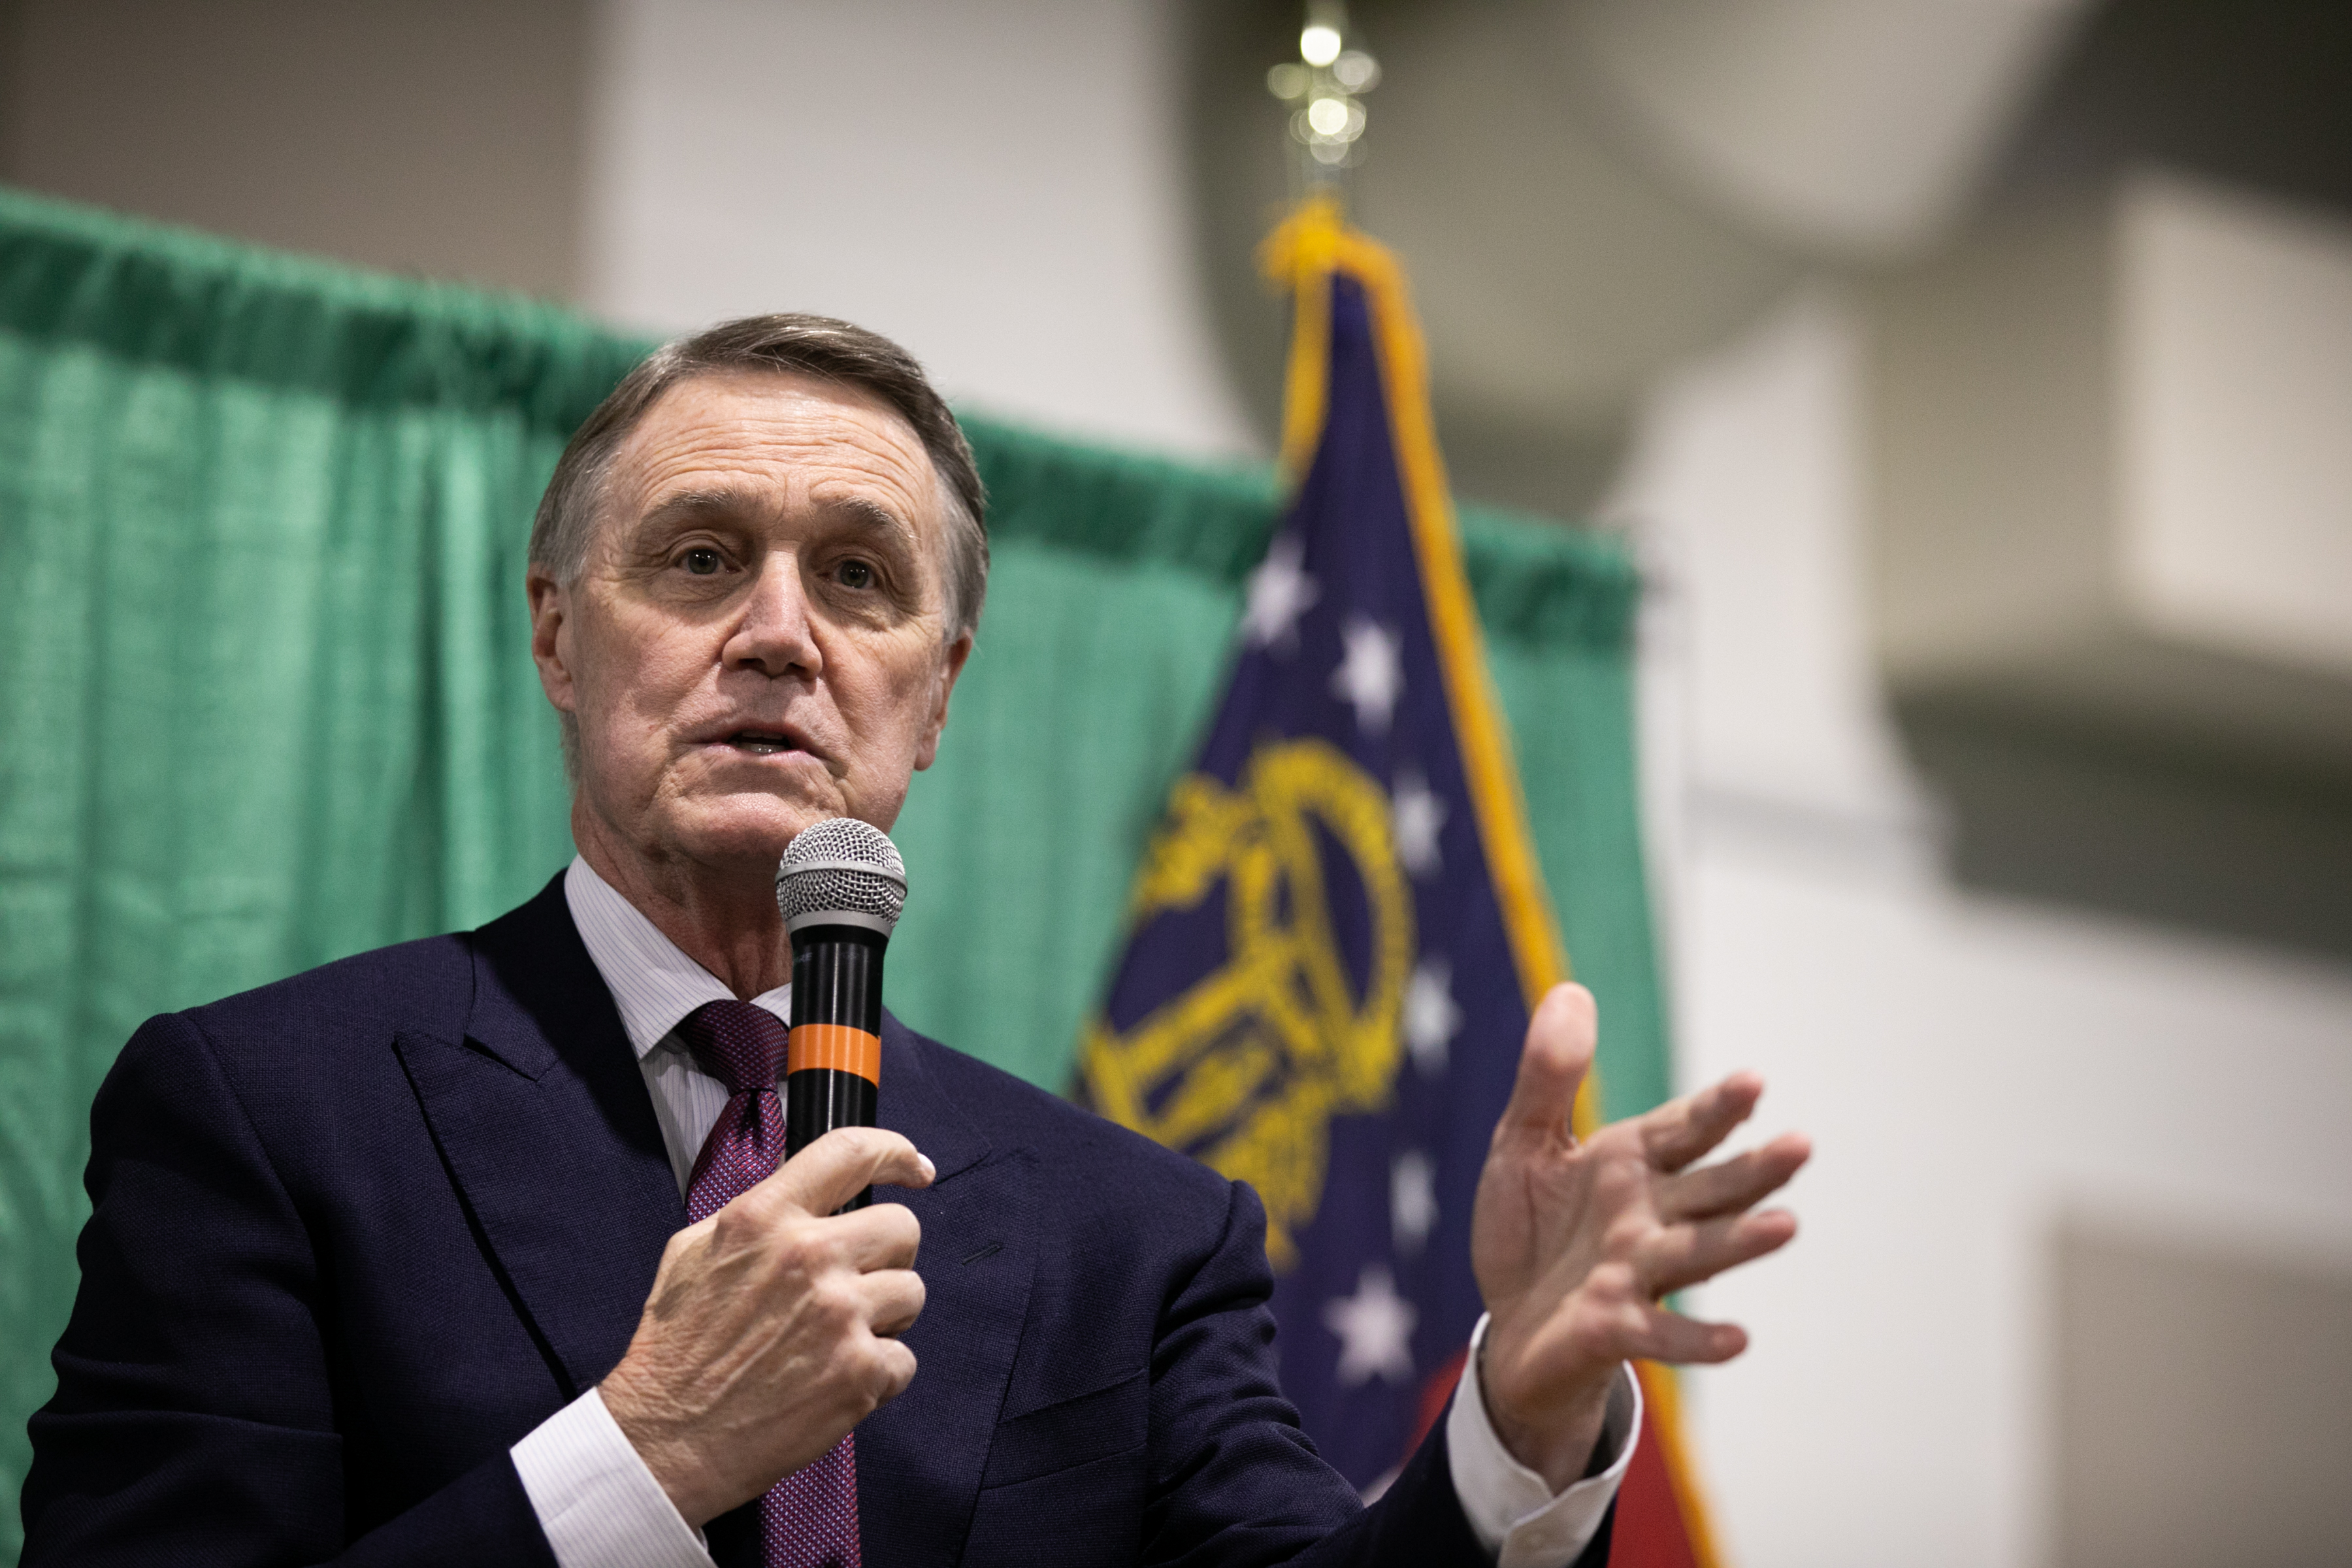 El senador David Purdue.